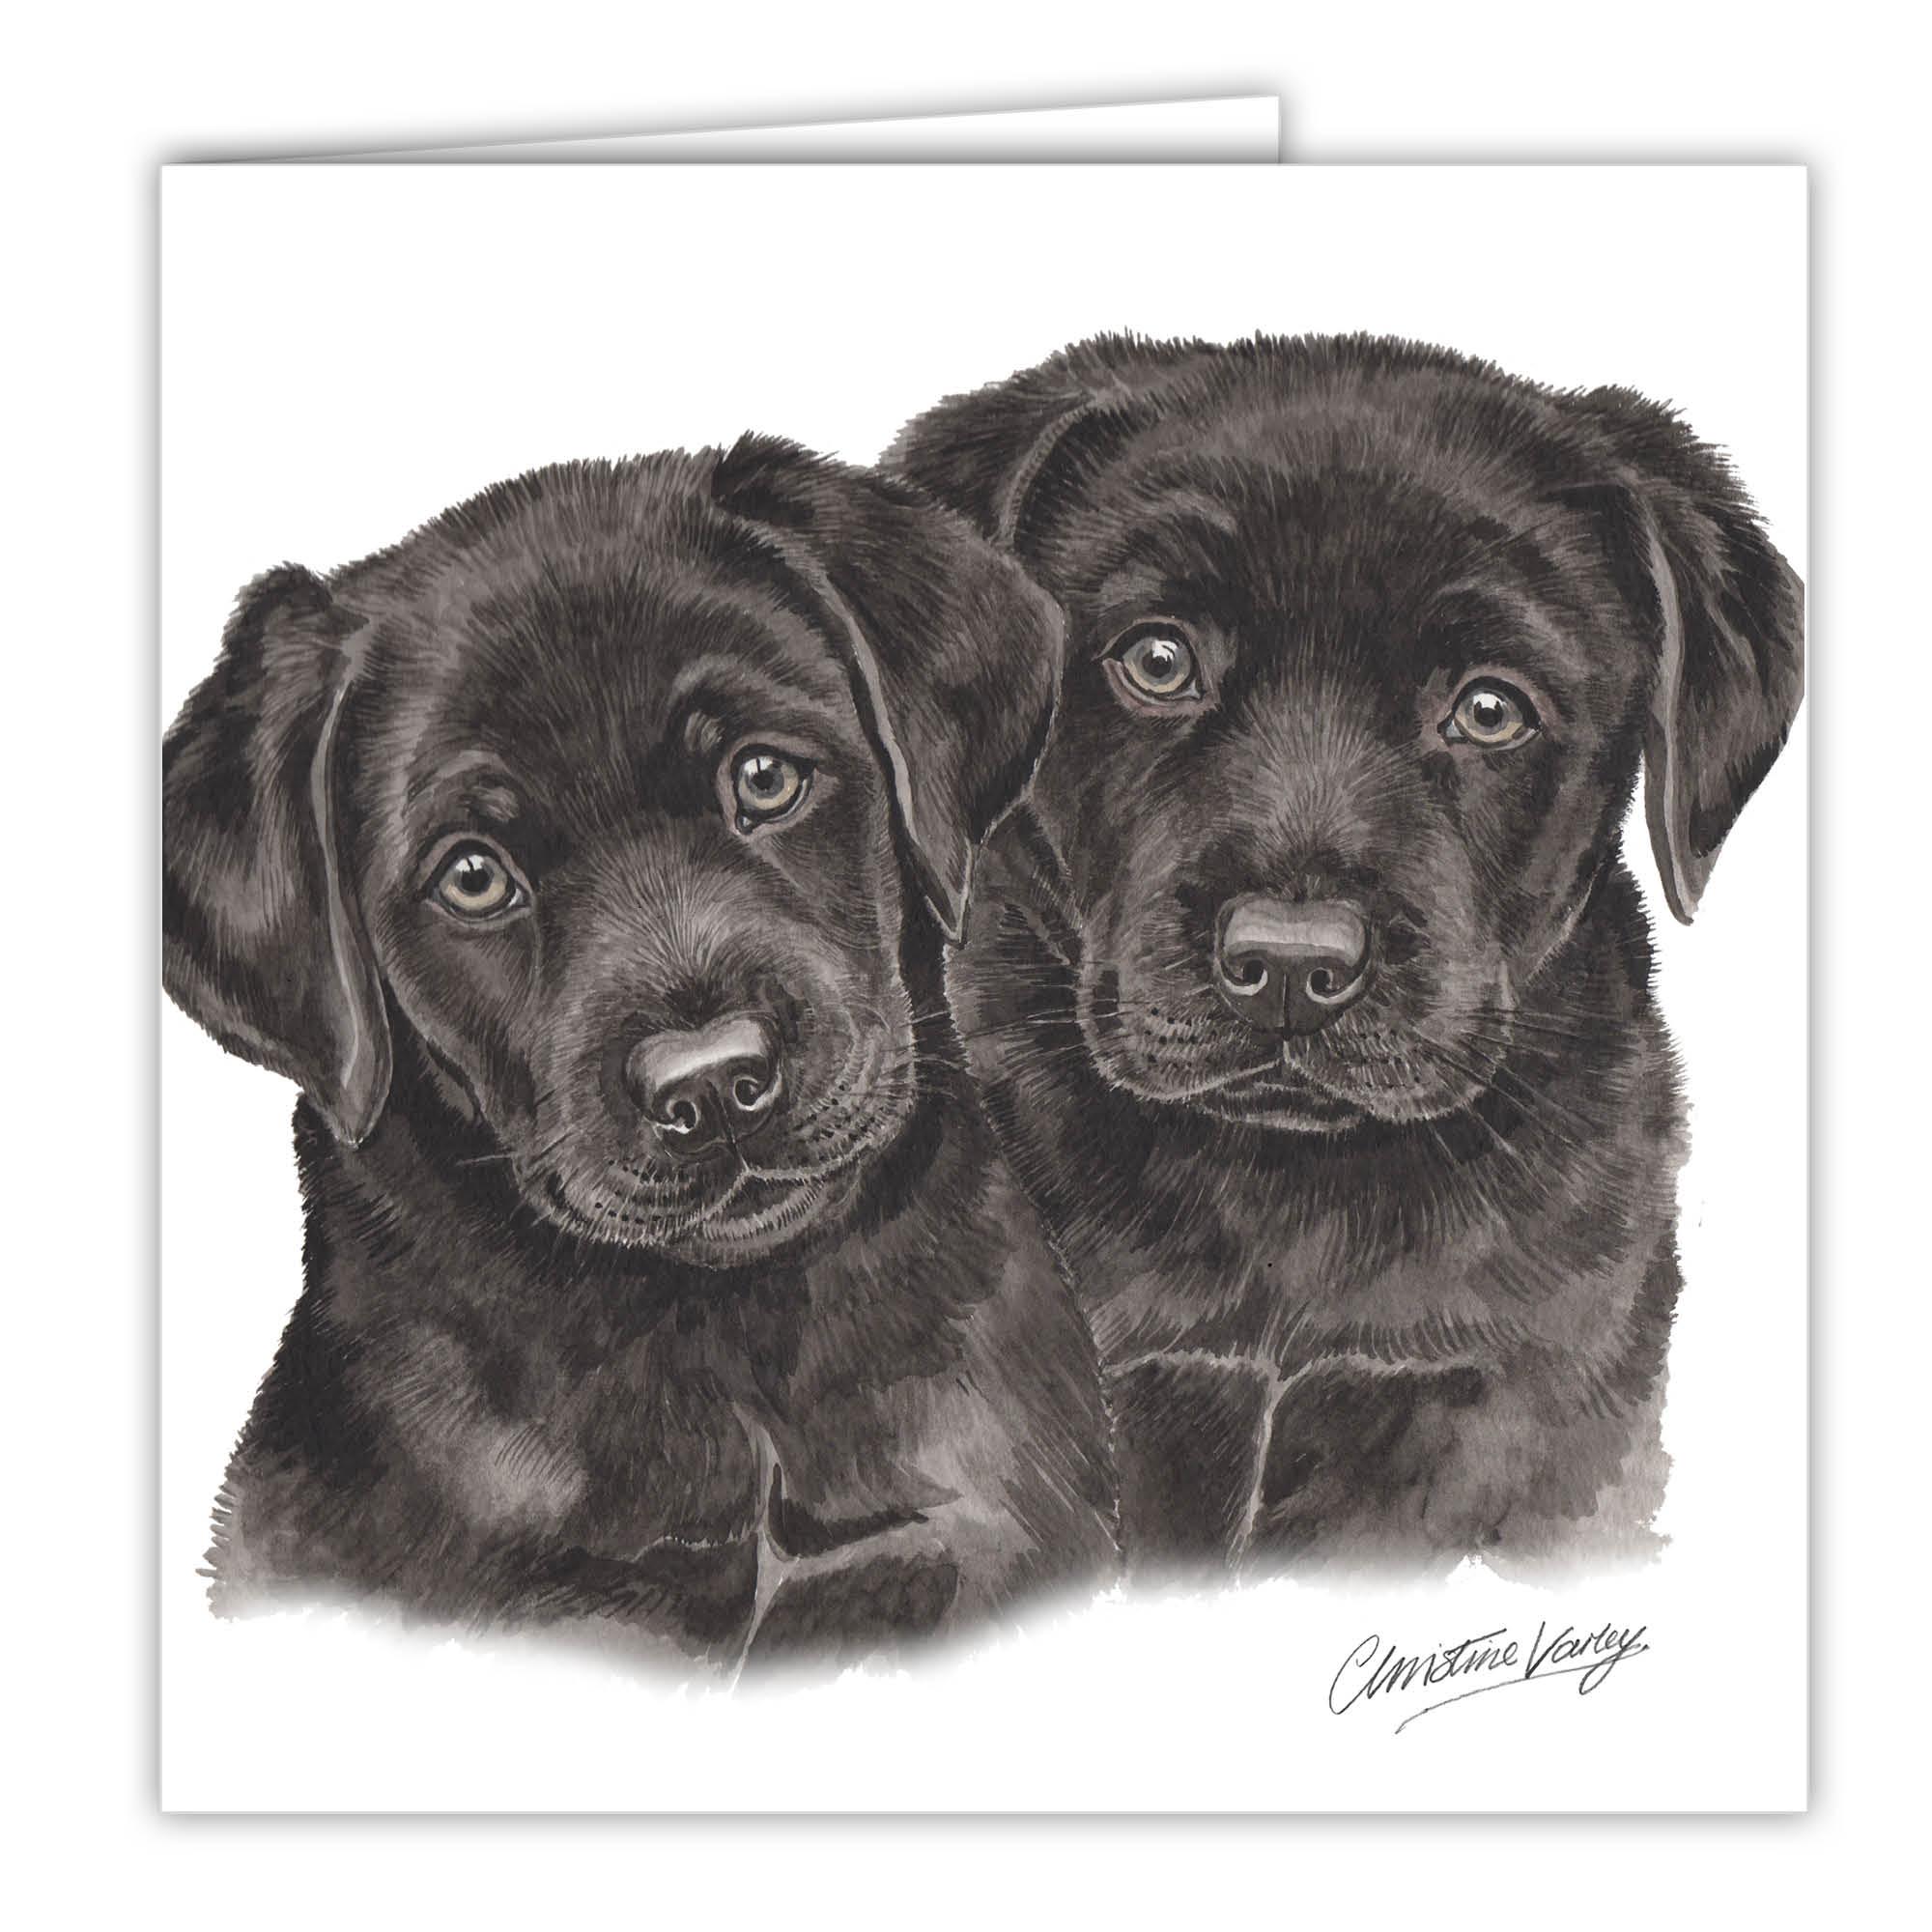 WaggyDogz Black Labrador Puppies Greetings Card